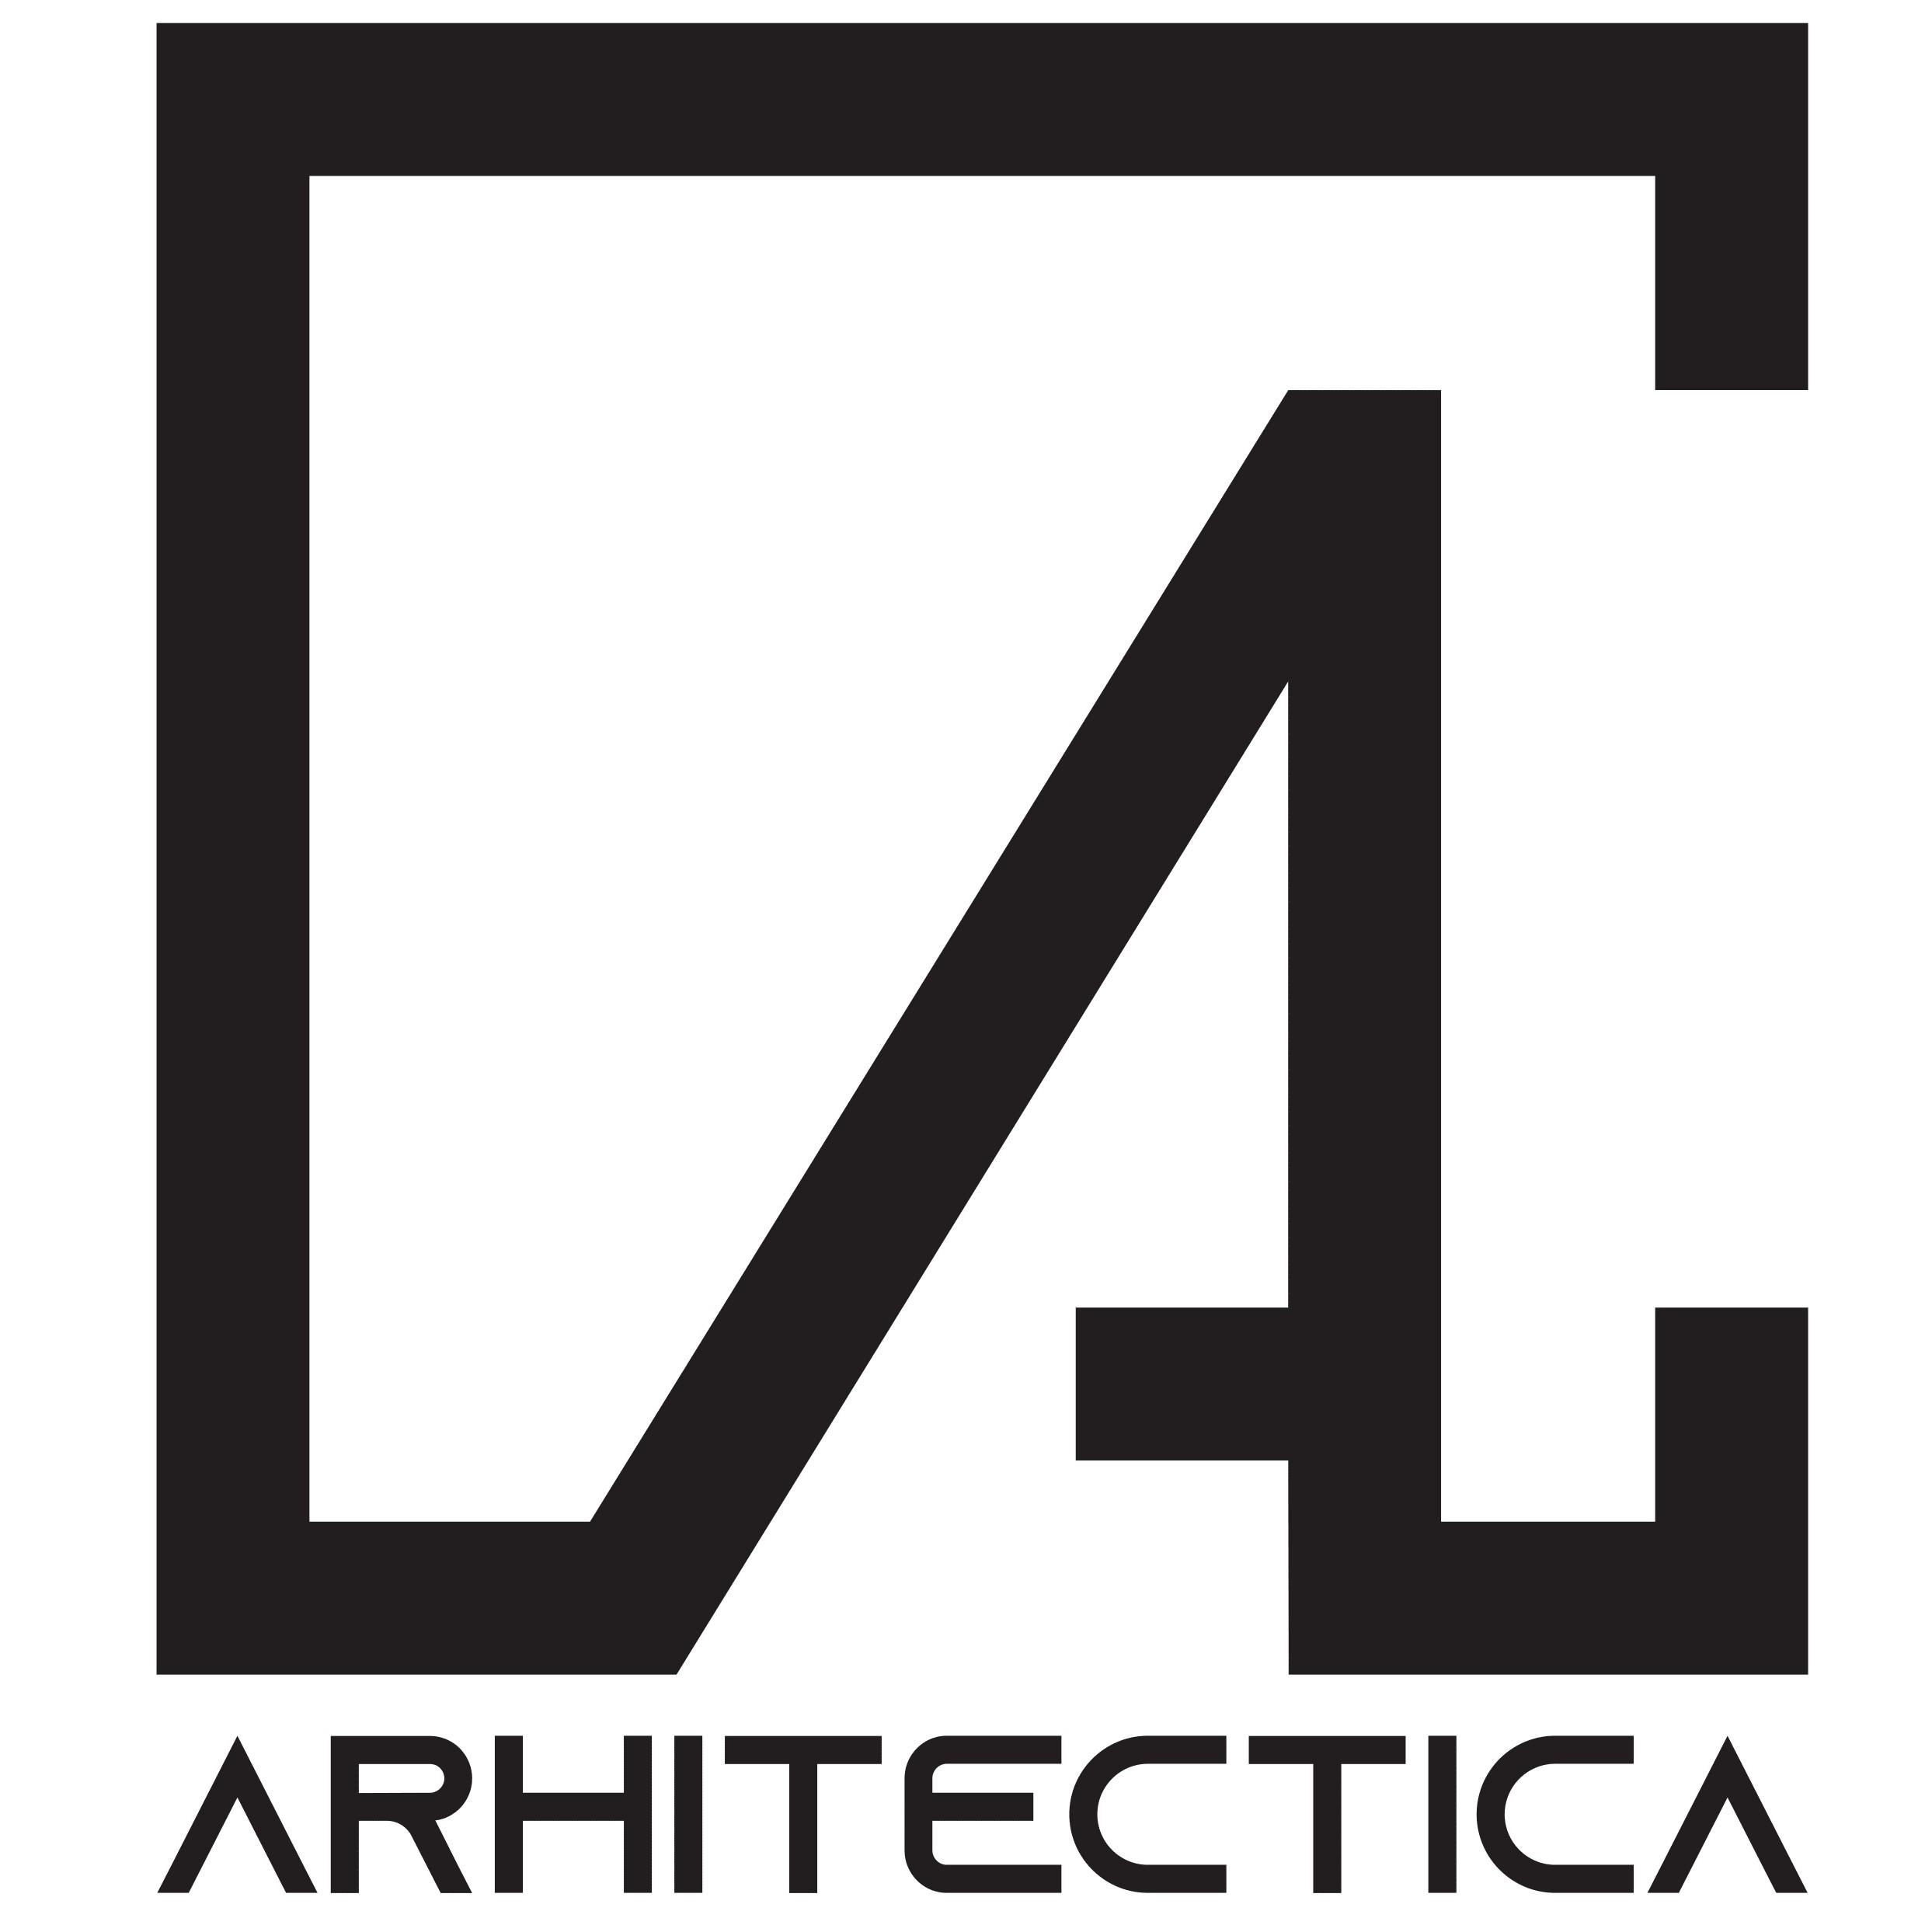 Arhitectica